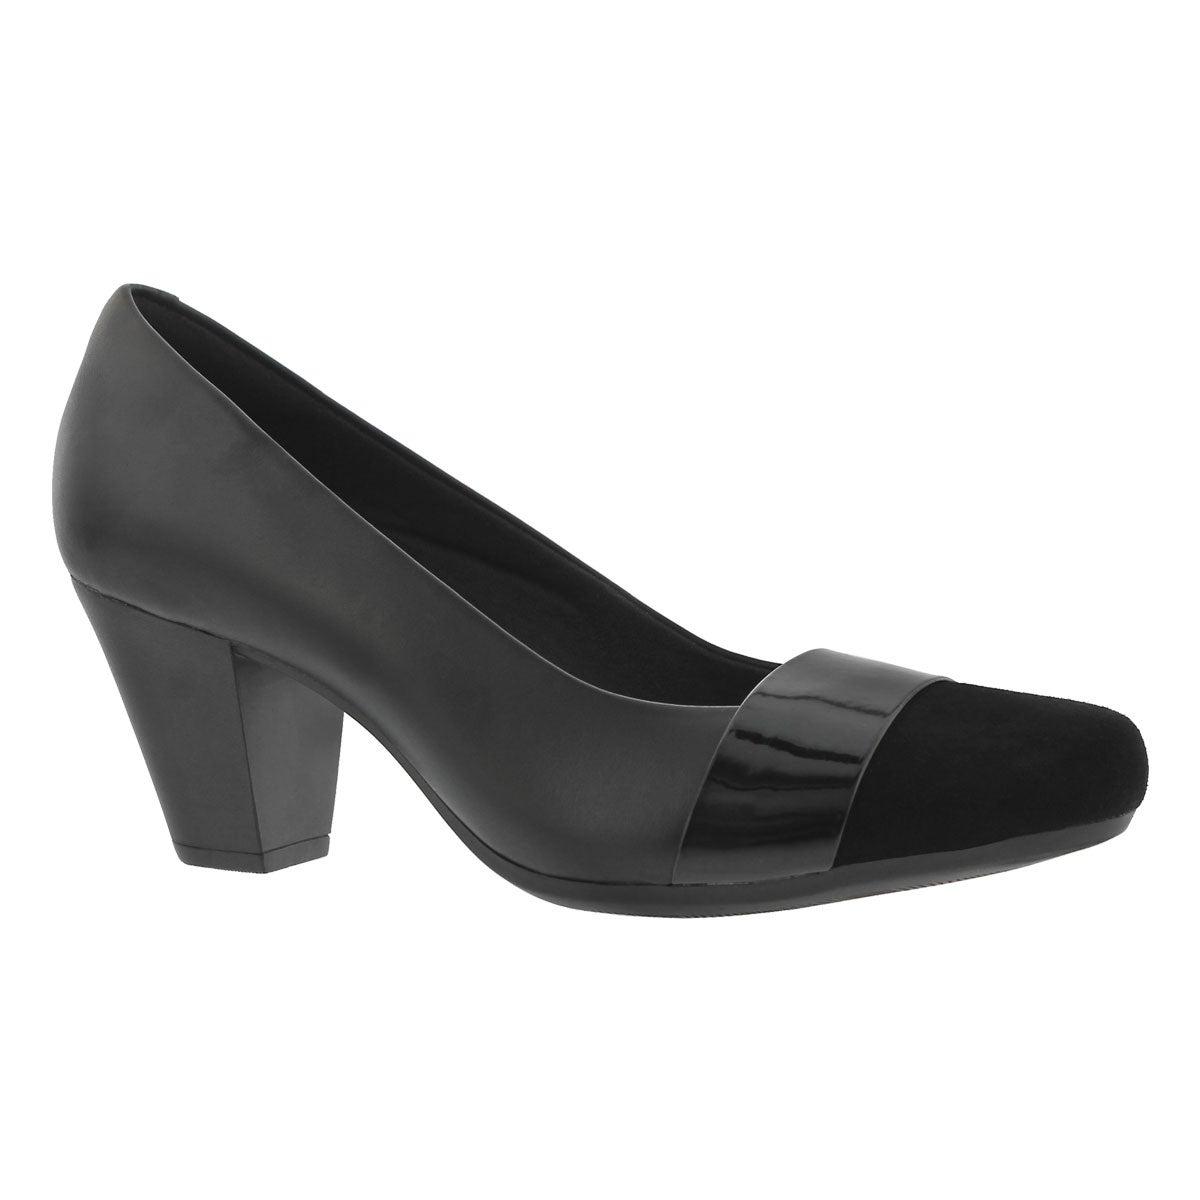 Women's GARNIT LUCIA black dress heels